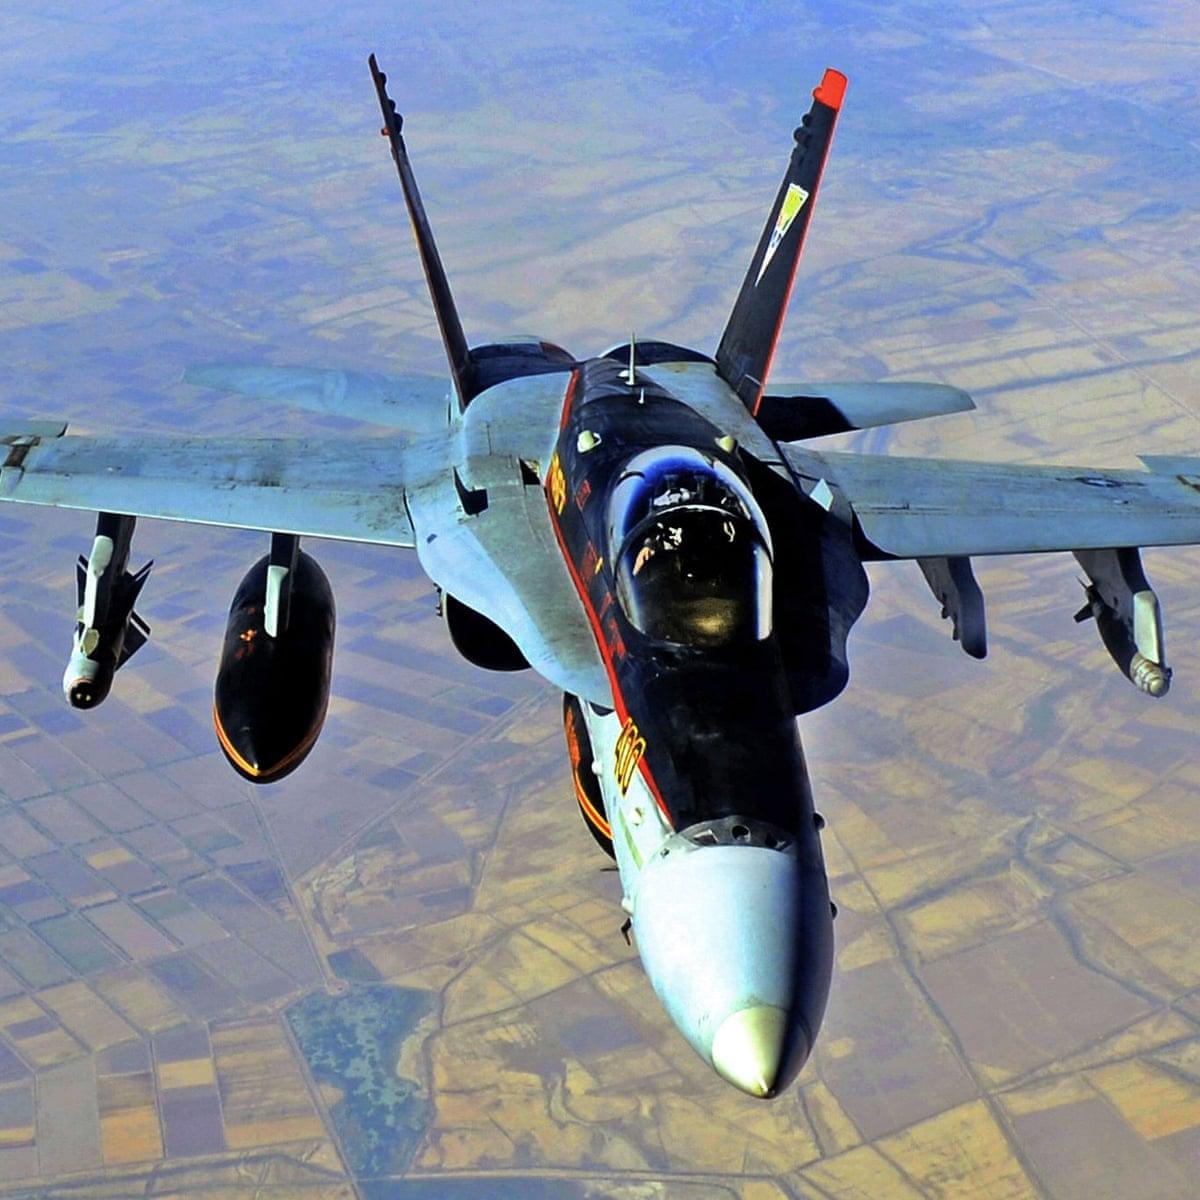 US strikes hit Iran-backed militia facilities in Iraq and Syria | Iraq |  The Guardian